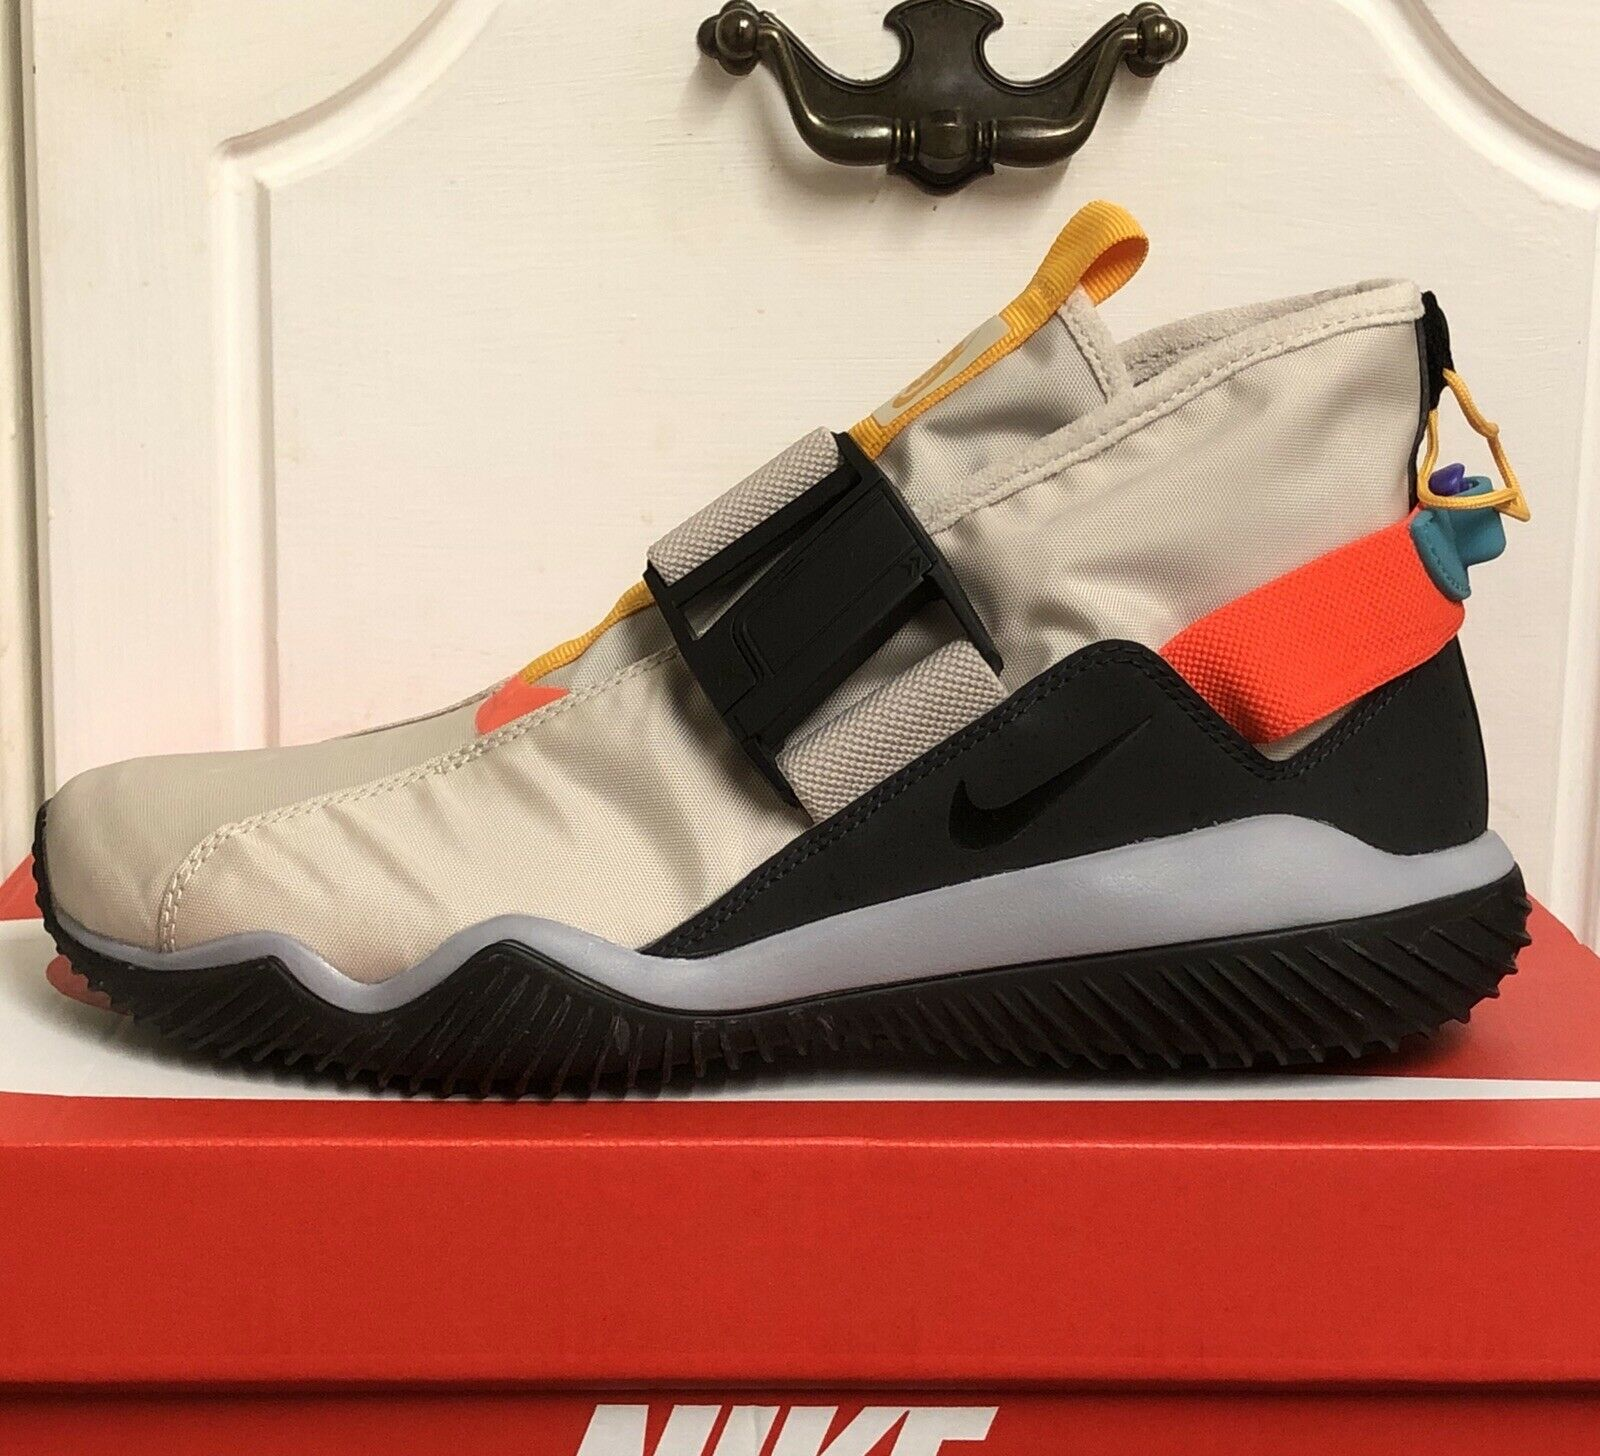 NIKE KOMYUTER SE TRAINERS Mens shoes Sneakers ACG COLOURWAY UK 11 EUR 46 US 12